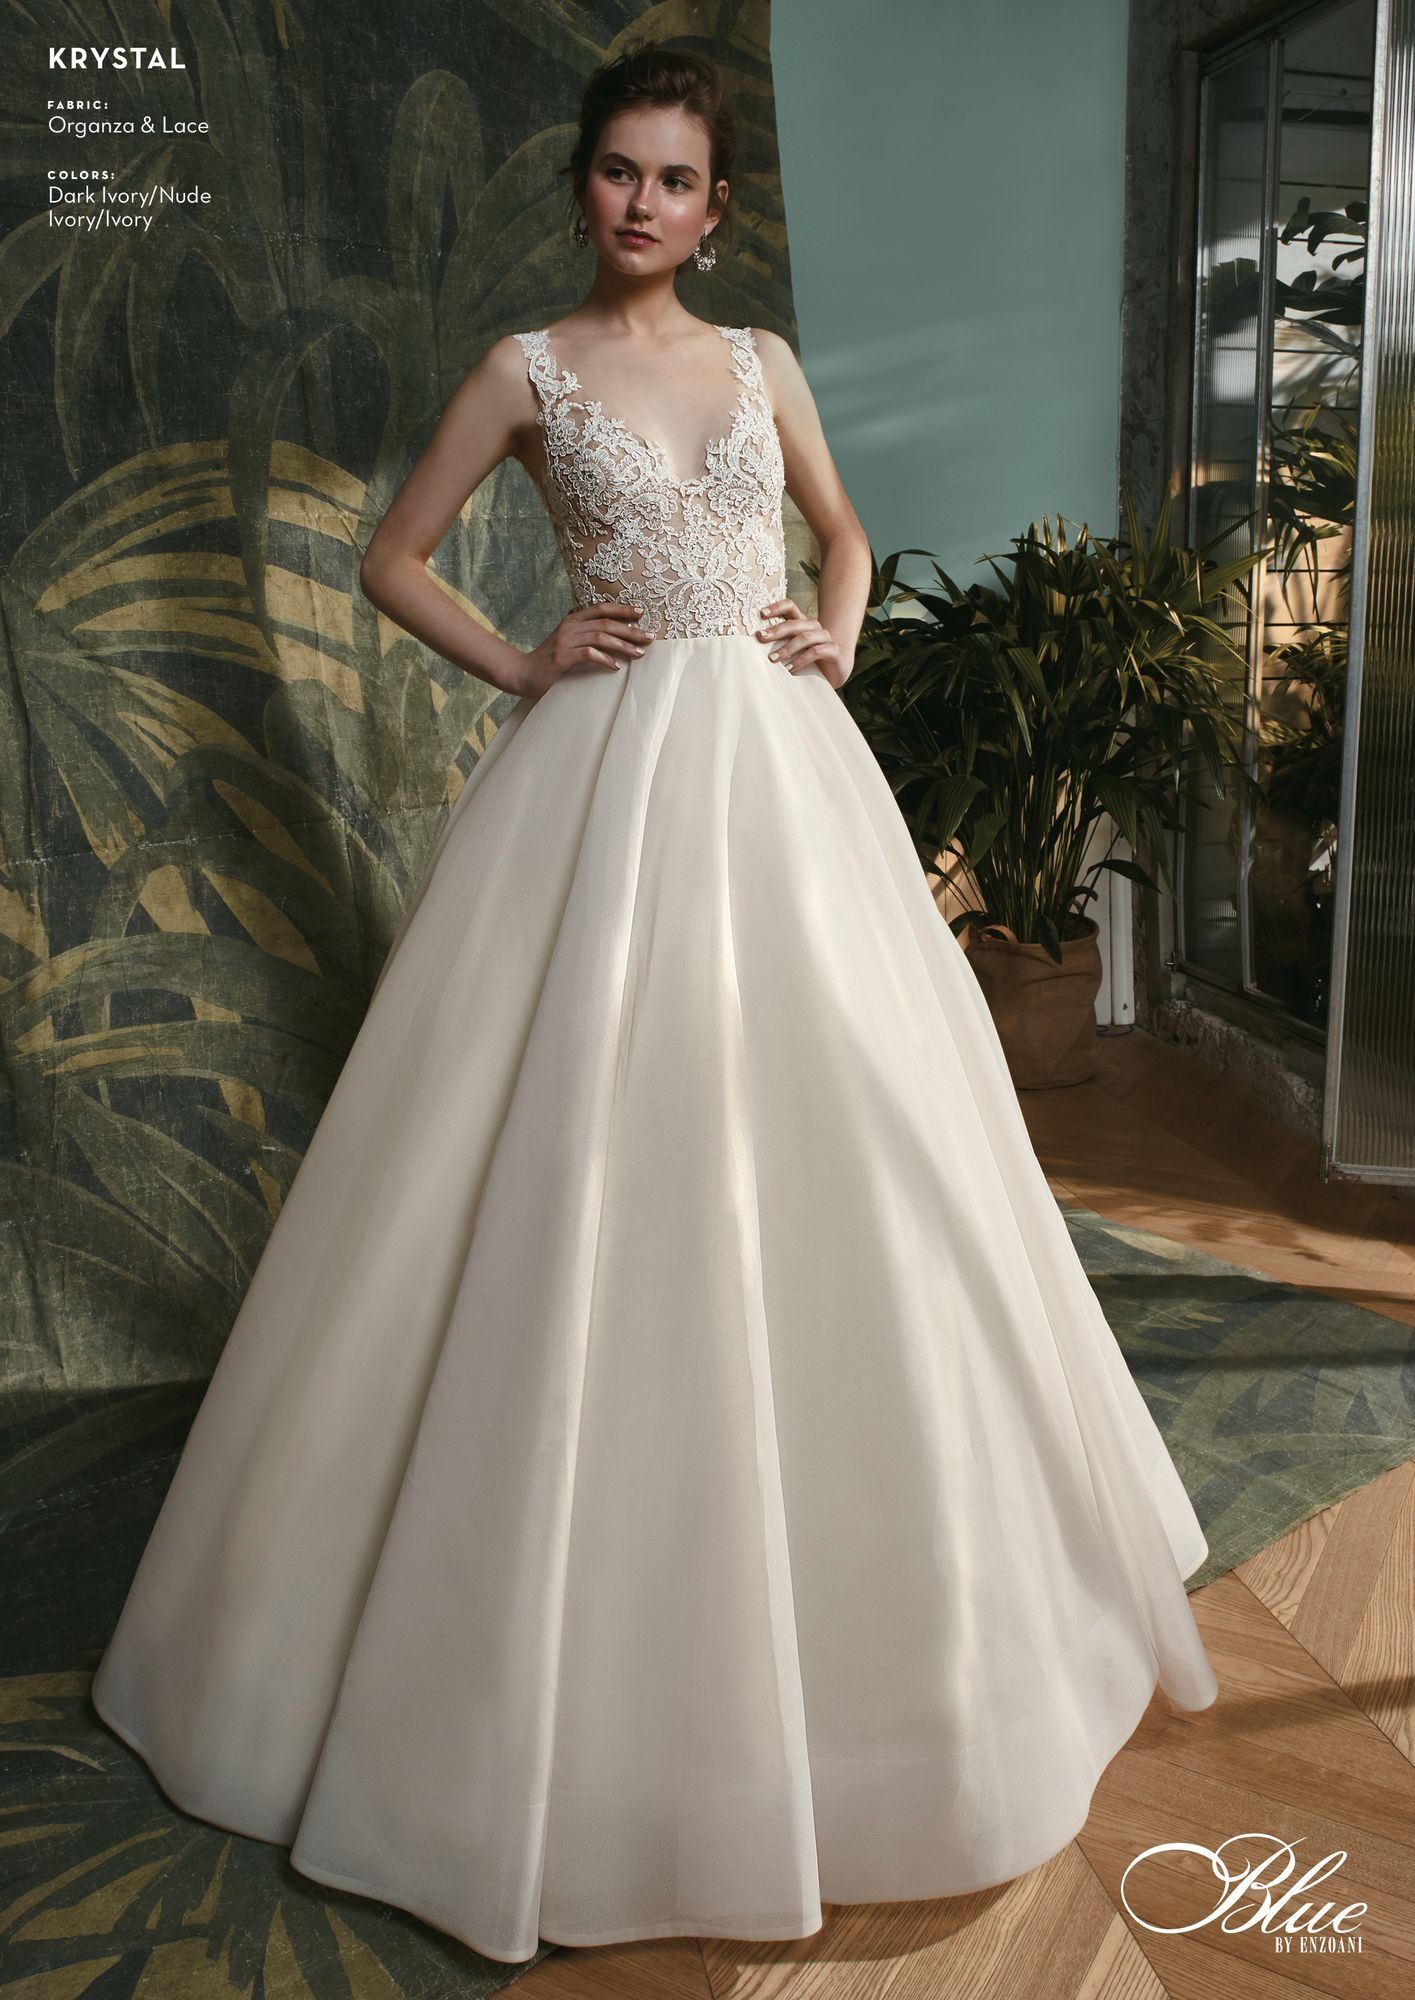 Bridal wardrobe krystal wedding pinterest wedding